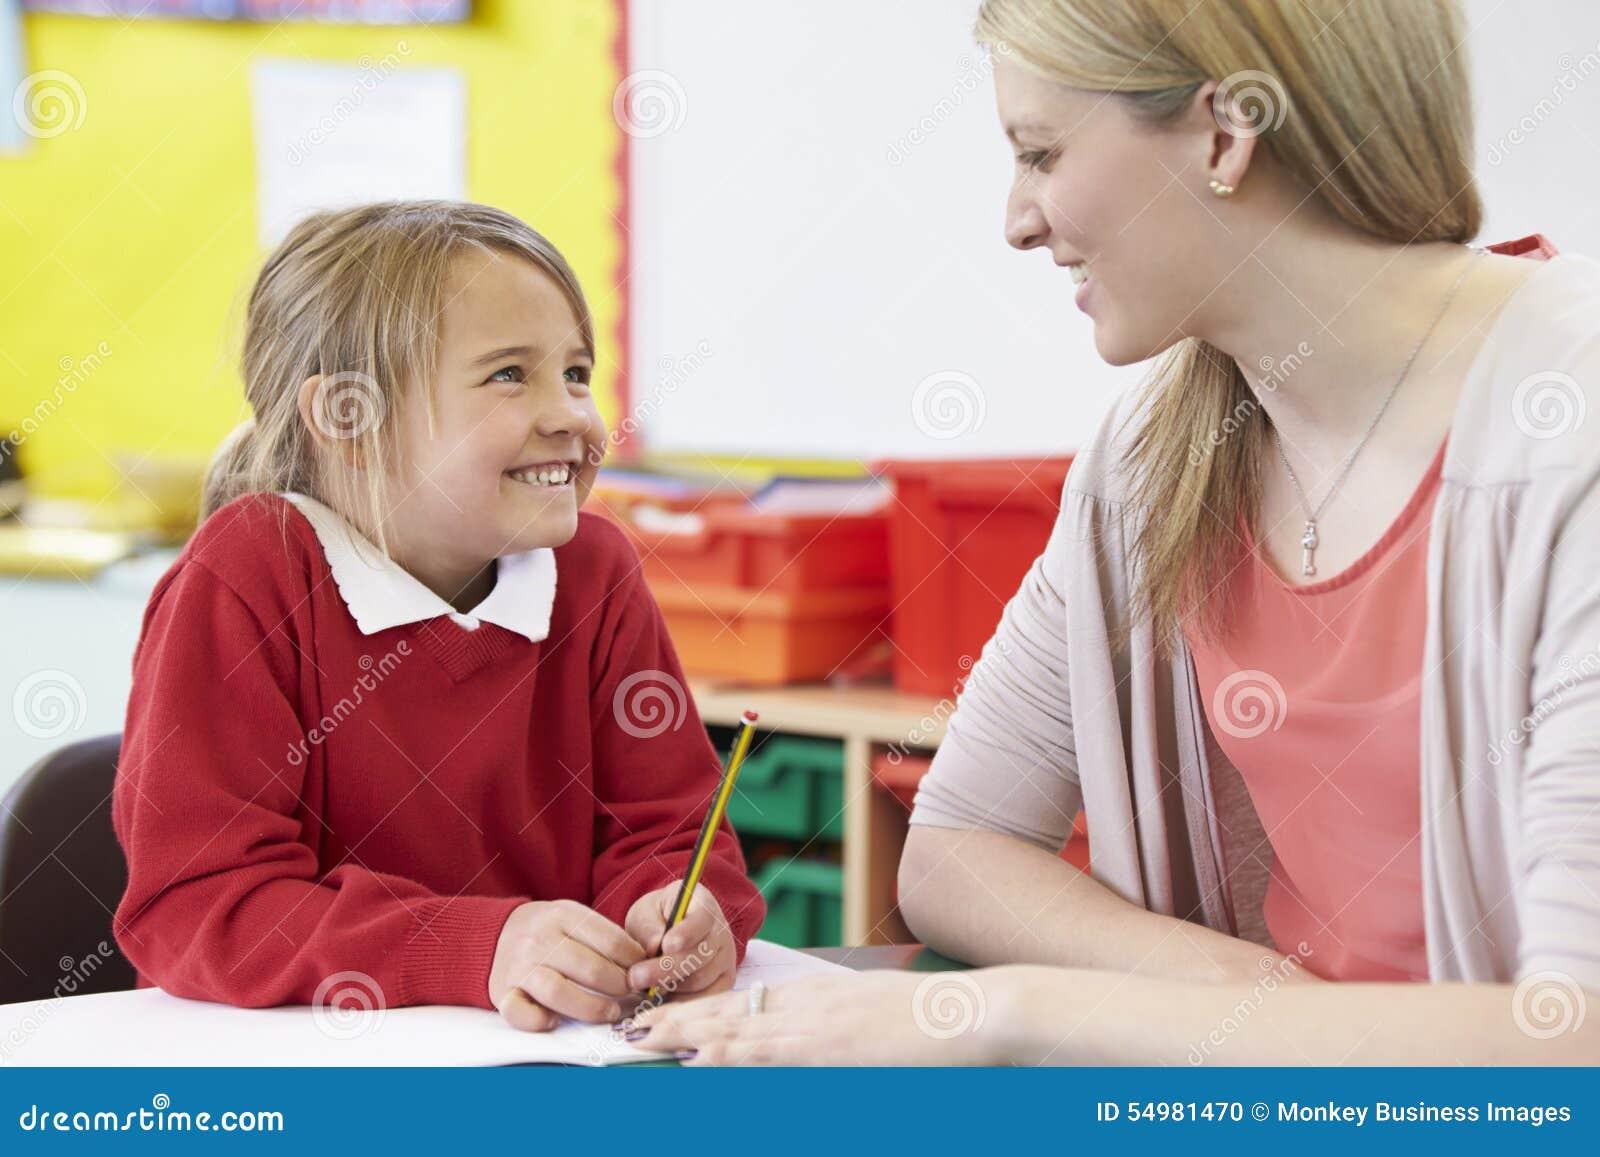 Lärare Helping Female Pupil med praktiserande handstil på skrivbordet